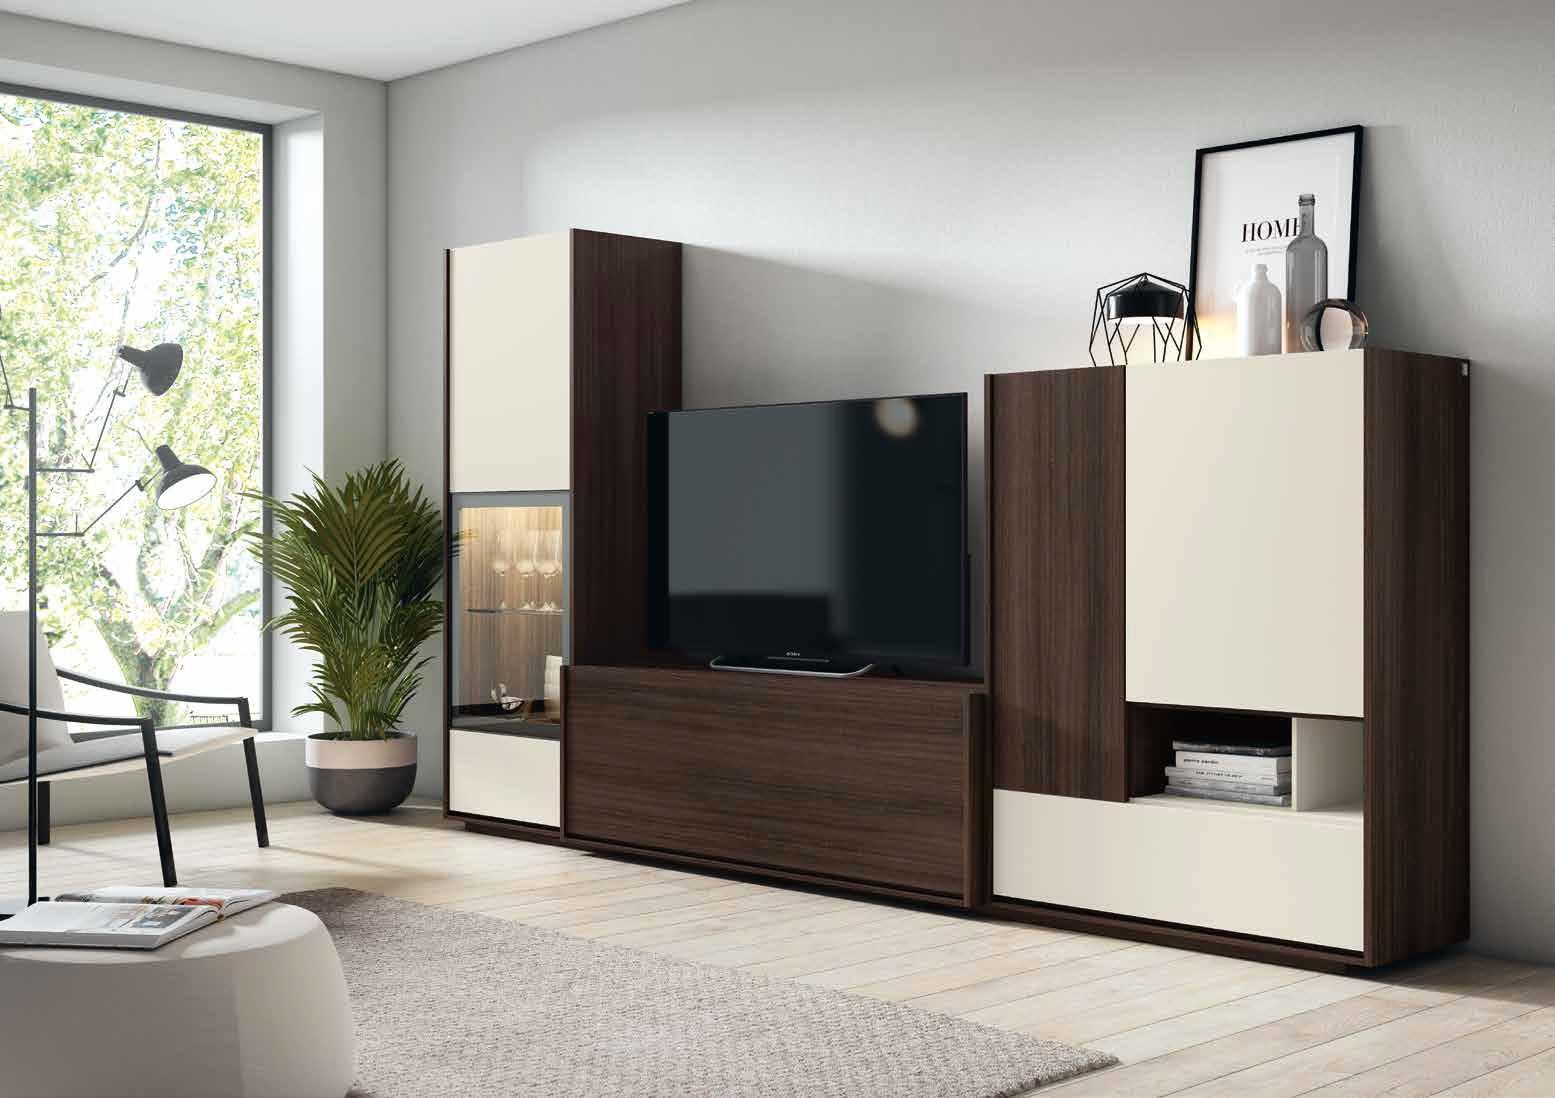 salon-moderno-Nativ-2019-muebles-paco-caballero-0920-5c8ceaa717f2c